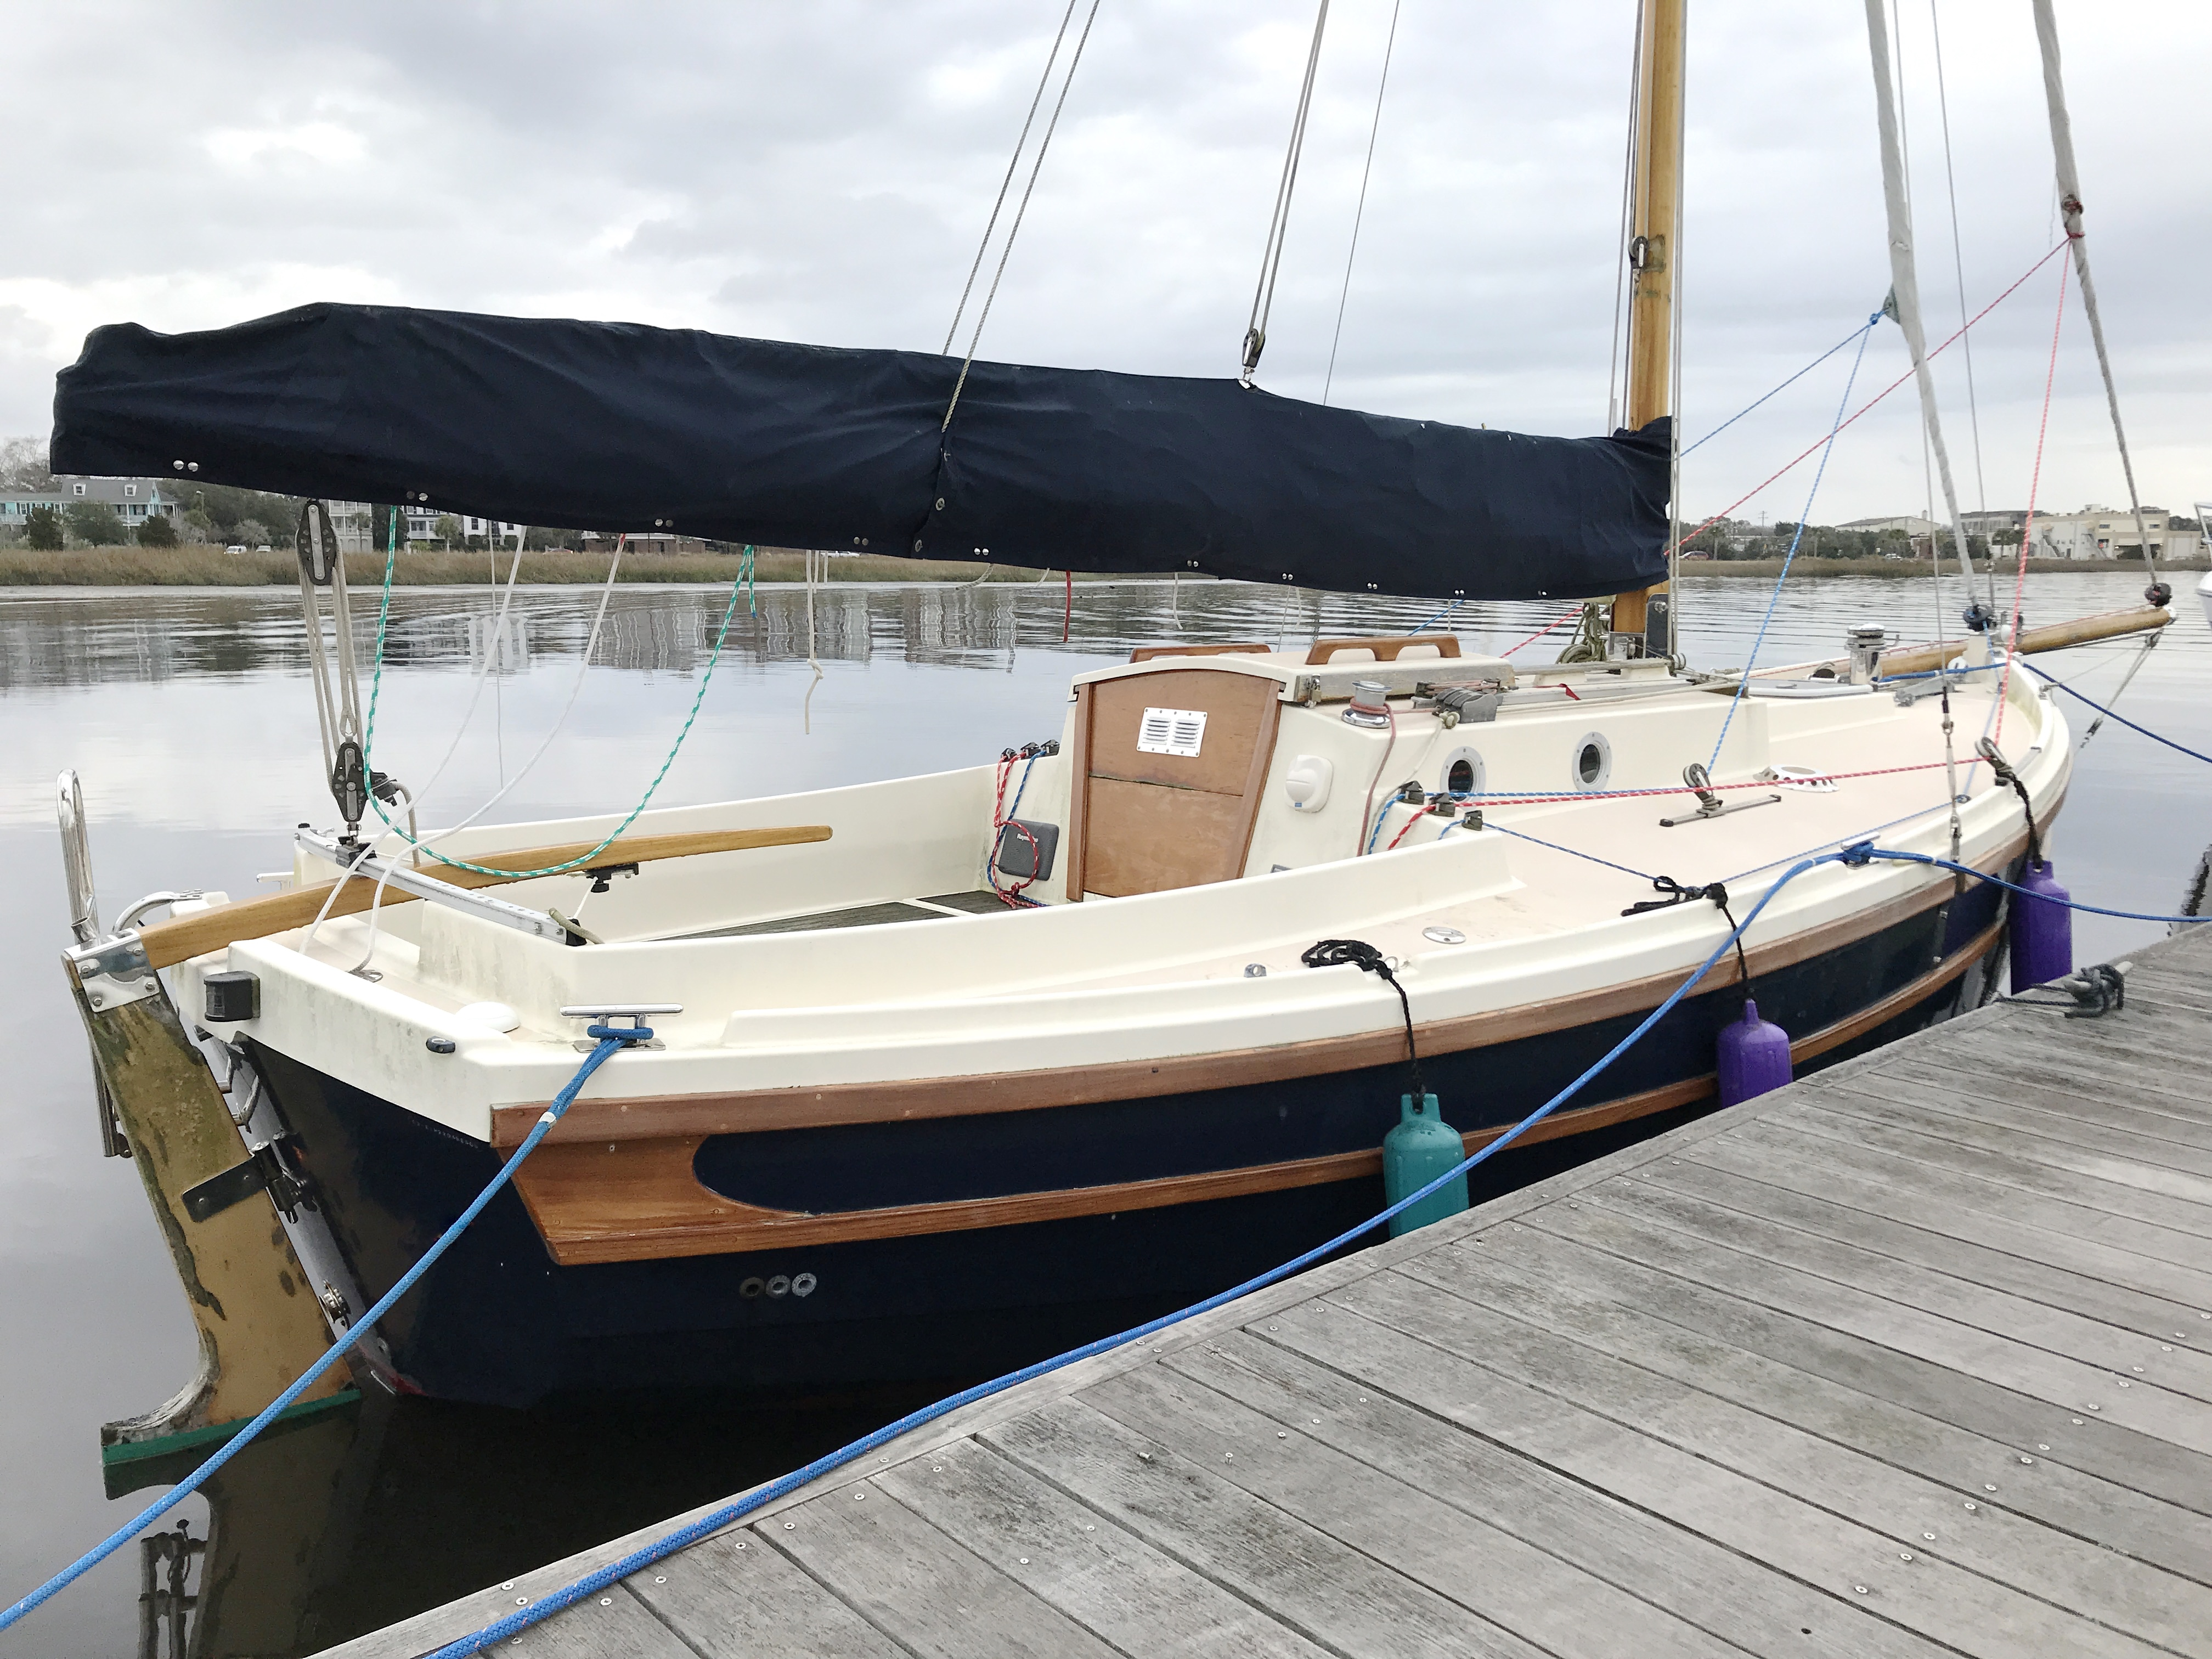 Cornish Crabbers Crabber 22 - Cornish Crabber 22 Gaf rigged cutter starboard